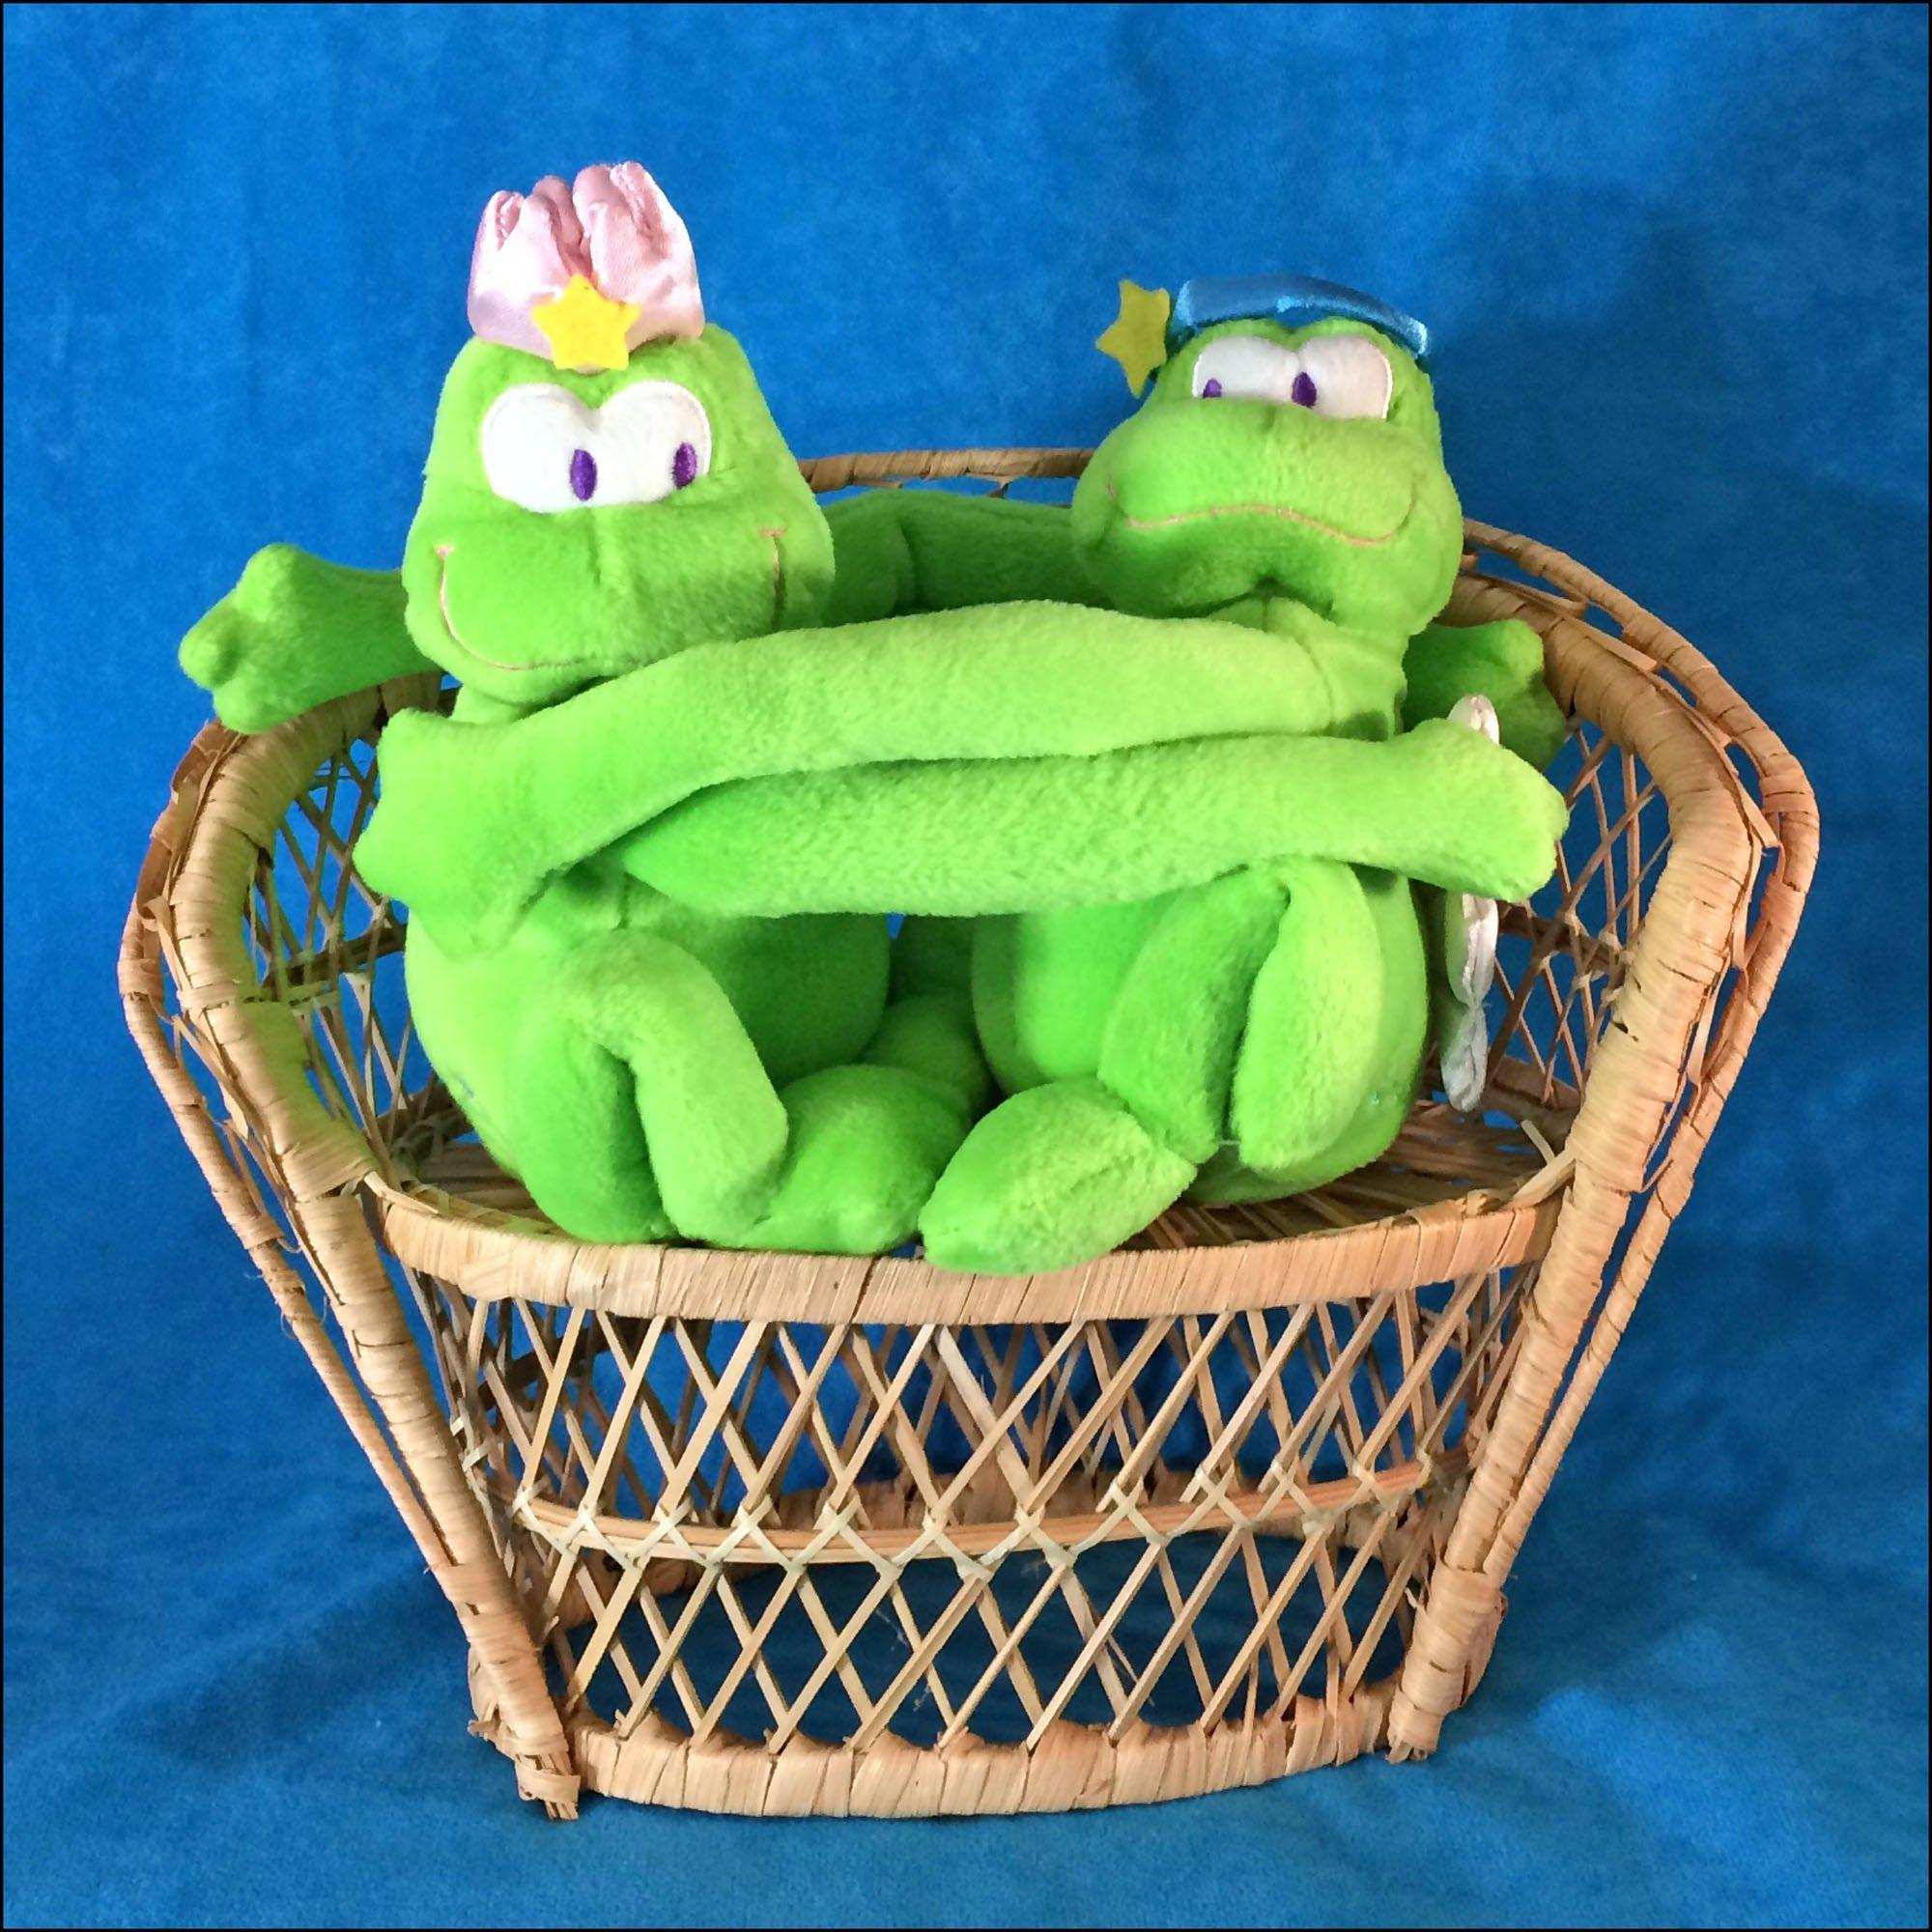 Vintage Plush Hugging Frogs in Wicker Chair Etsy in 2020